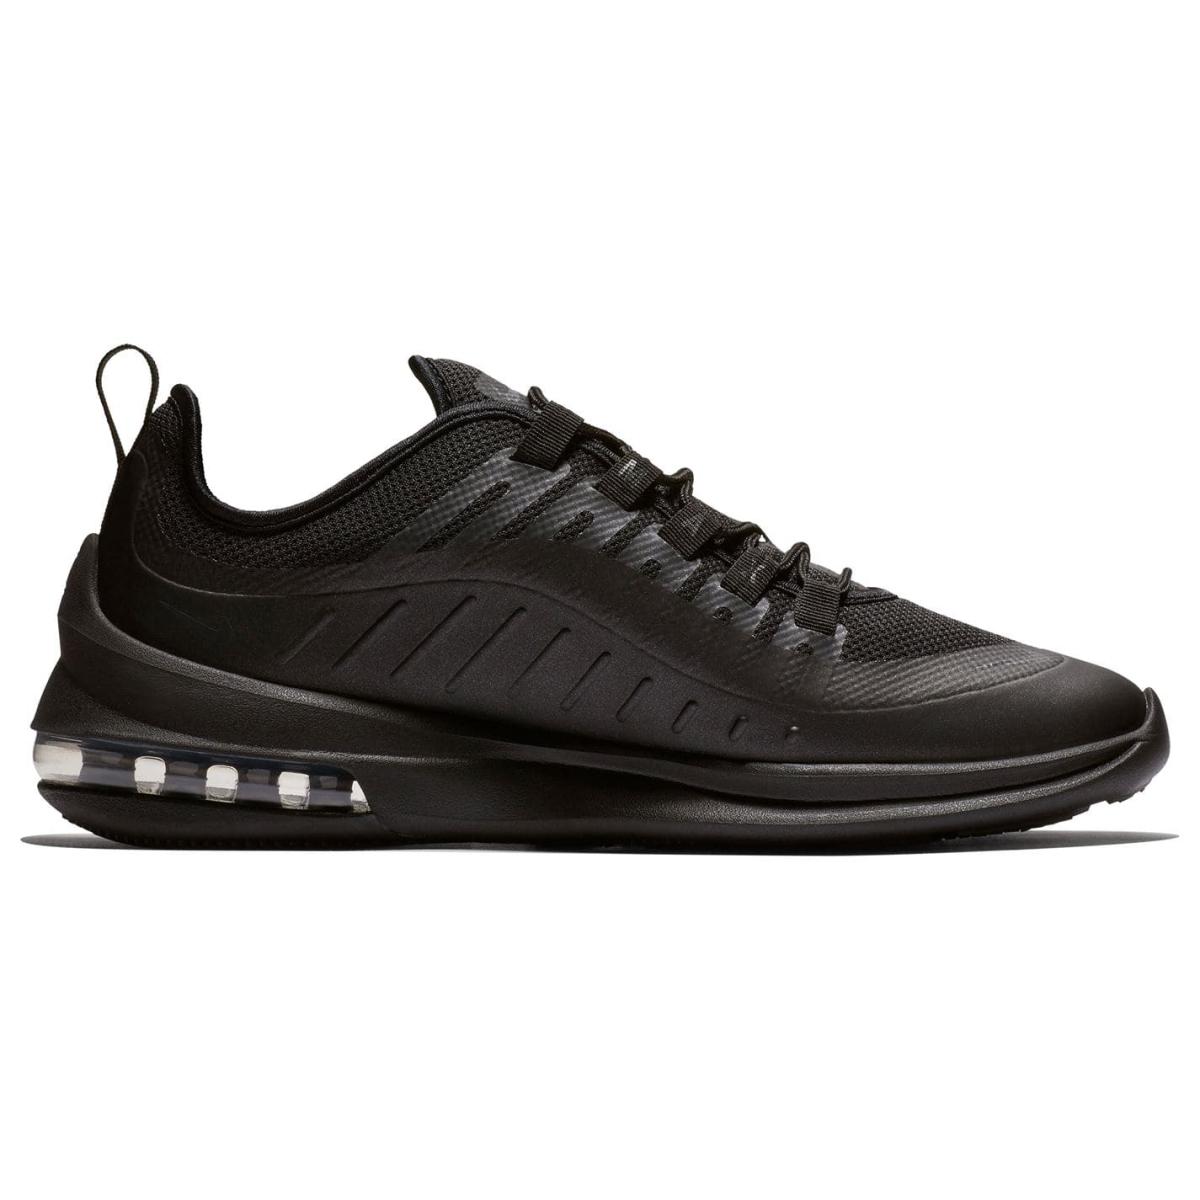 NIKE-Air-Max-Axis-Scarpe-da-ginnastica-Scarpe-da-Corsa-Uomo-Sneaker-Scarpe-Sportive-Fitness-1313 miniatura 10